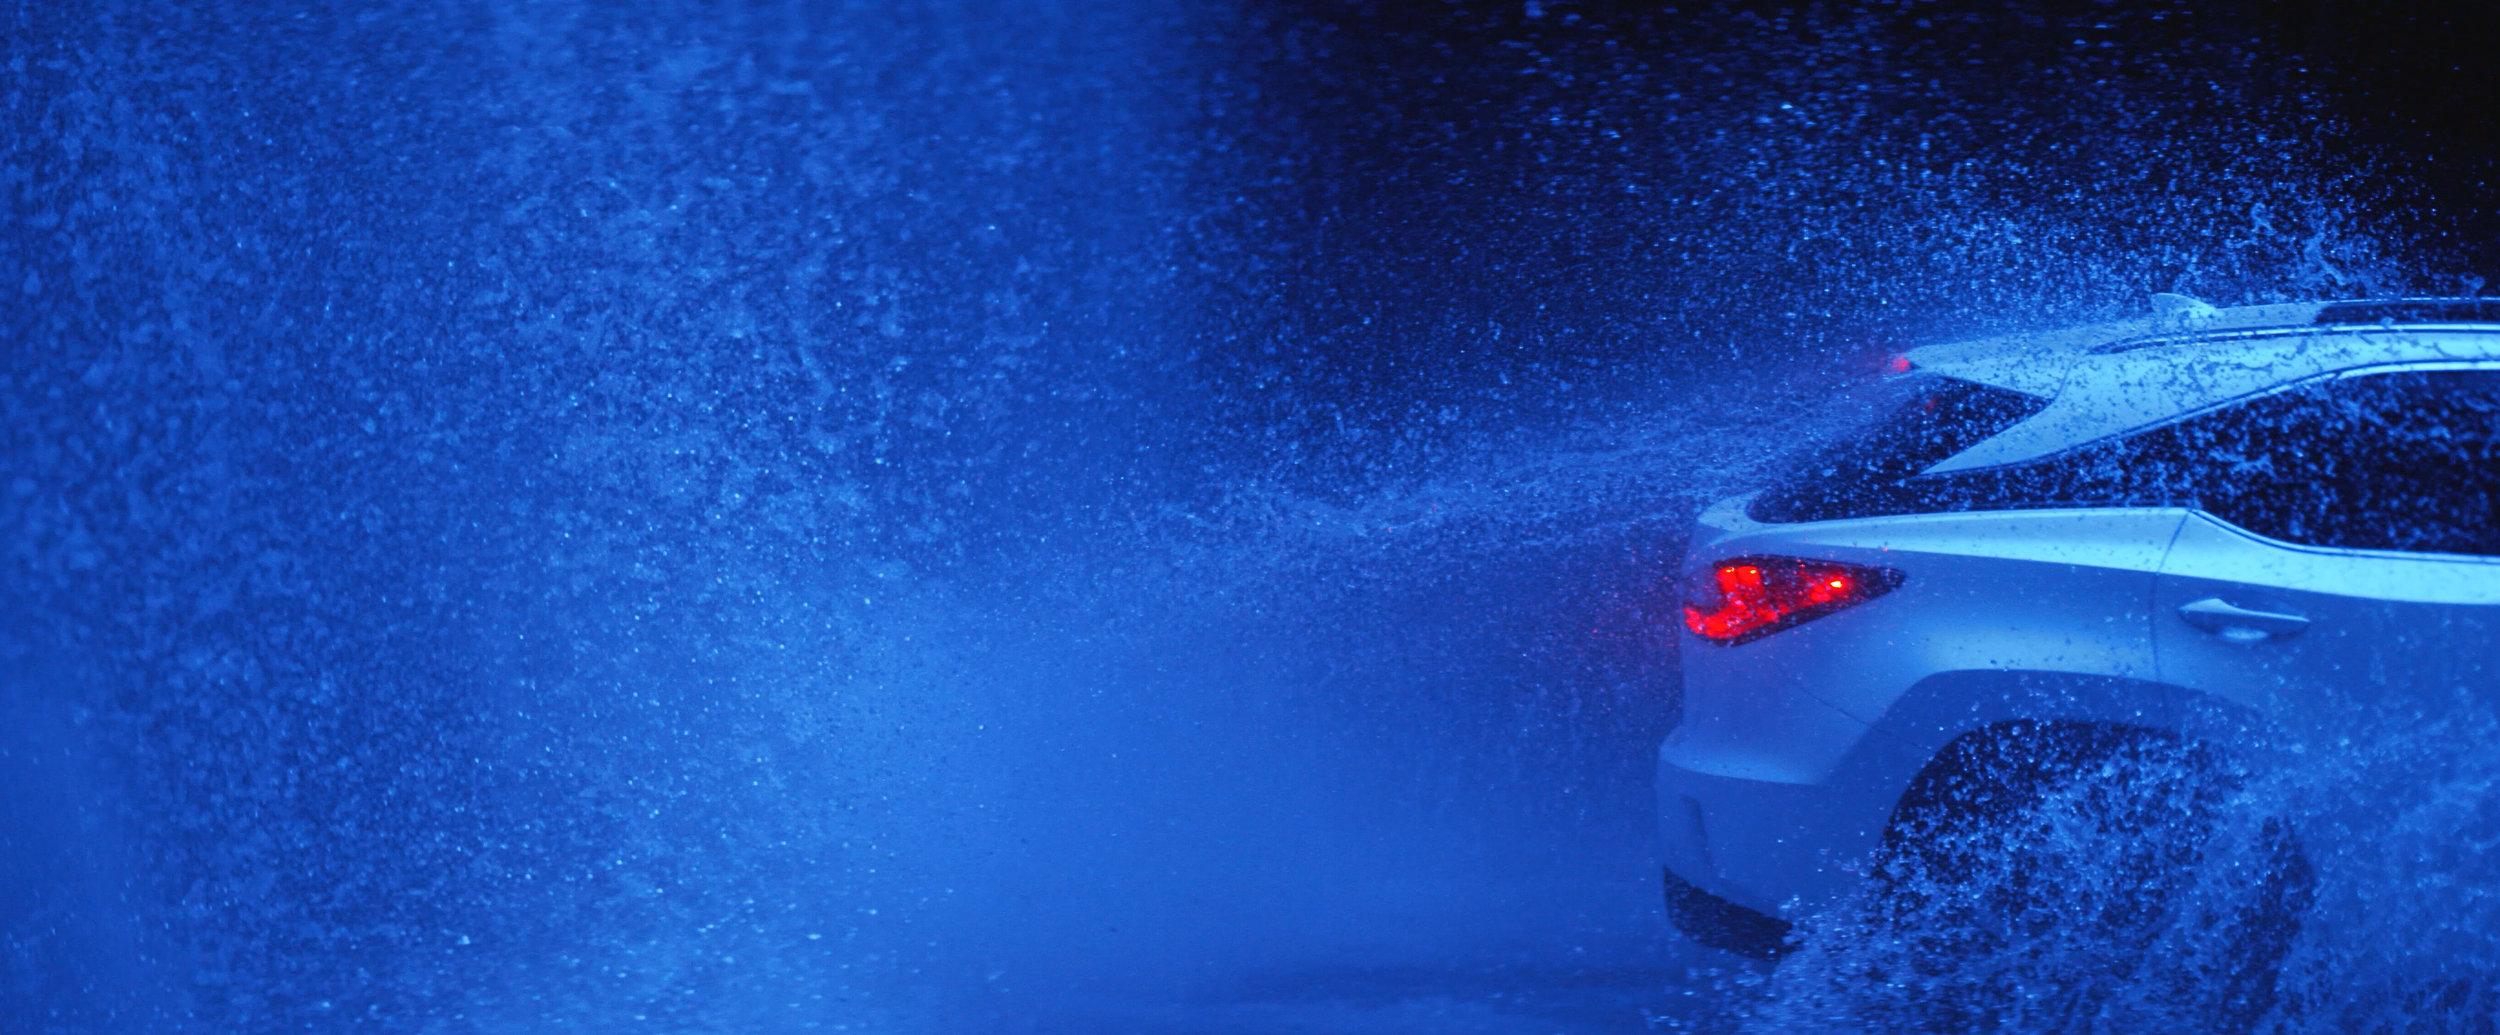 Oliver Millar Lexus_Blue.jpg